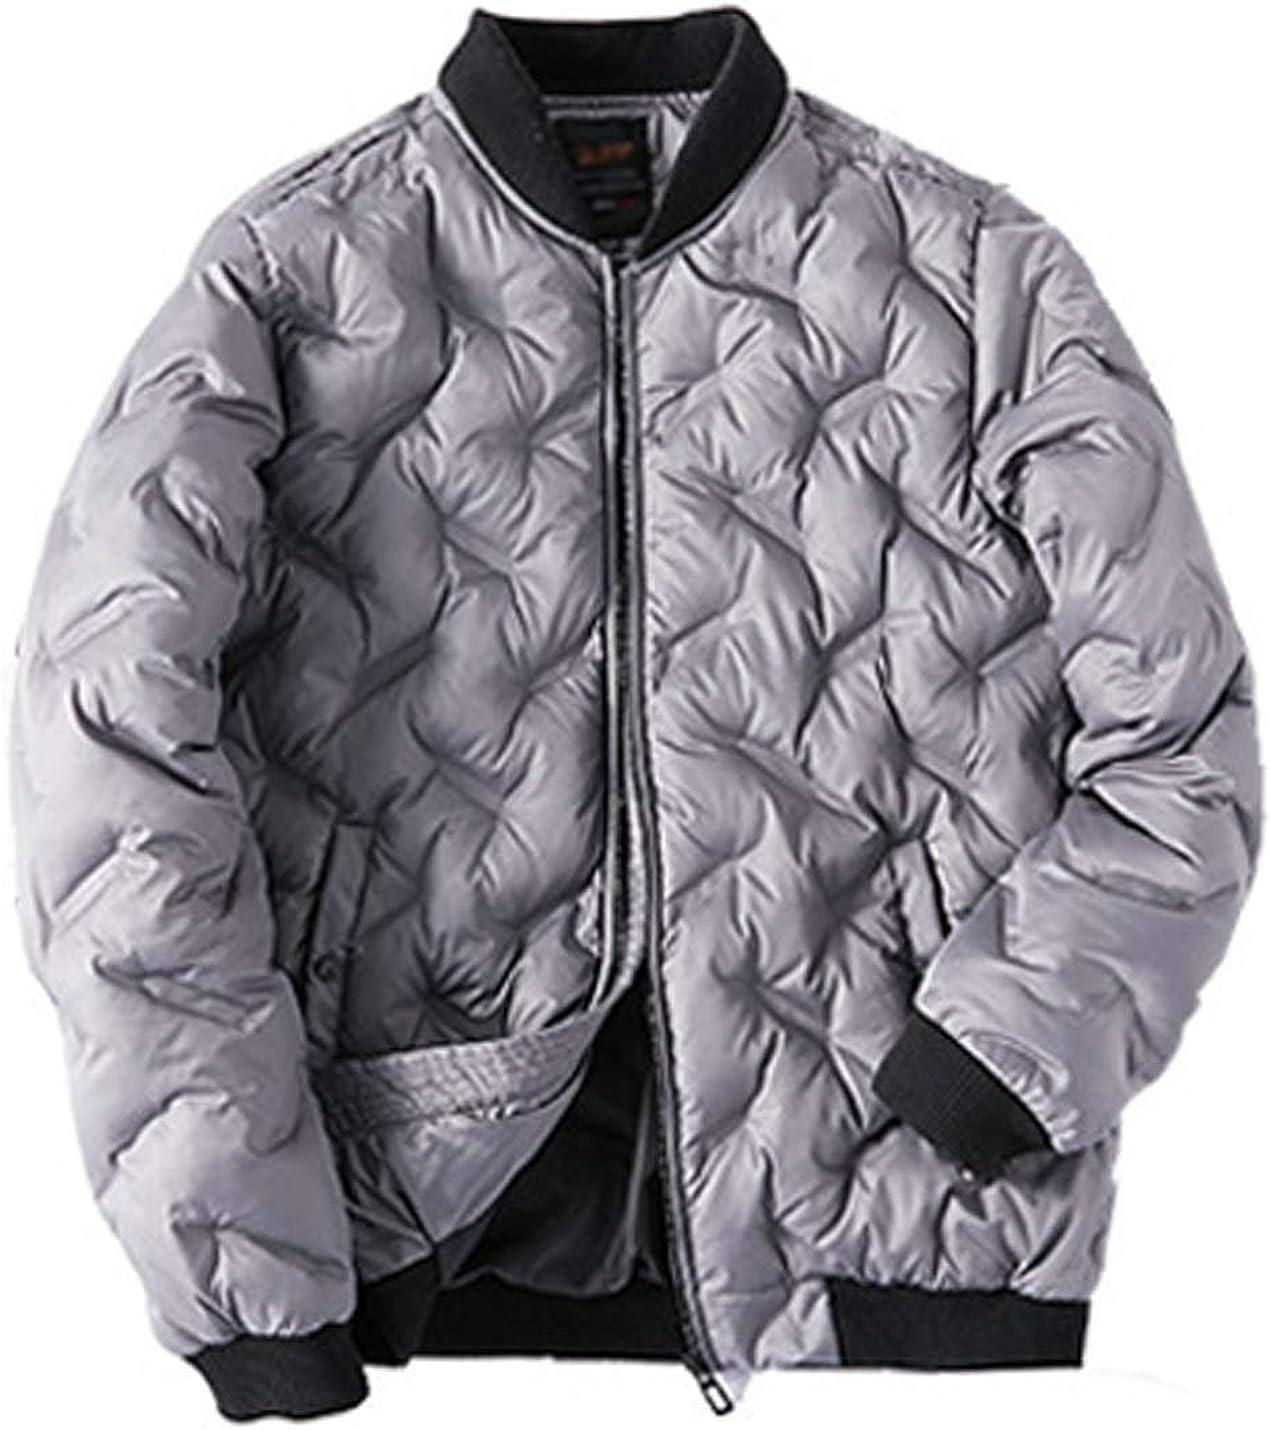 ZGZZ7 Men's Winter Warm Puffy Coats Outerwear Quilted Cotton Padded Puffer Coats Baseball Jackets